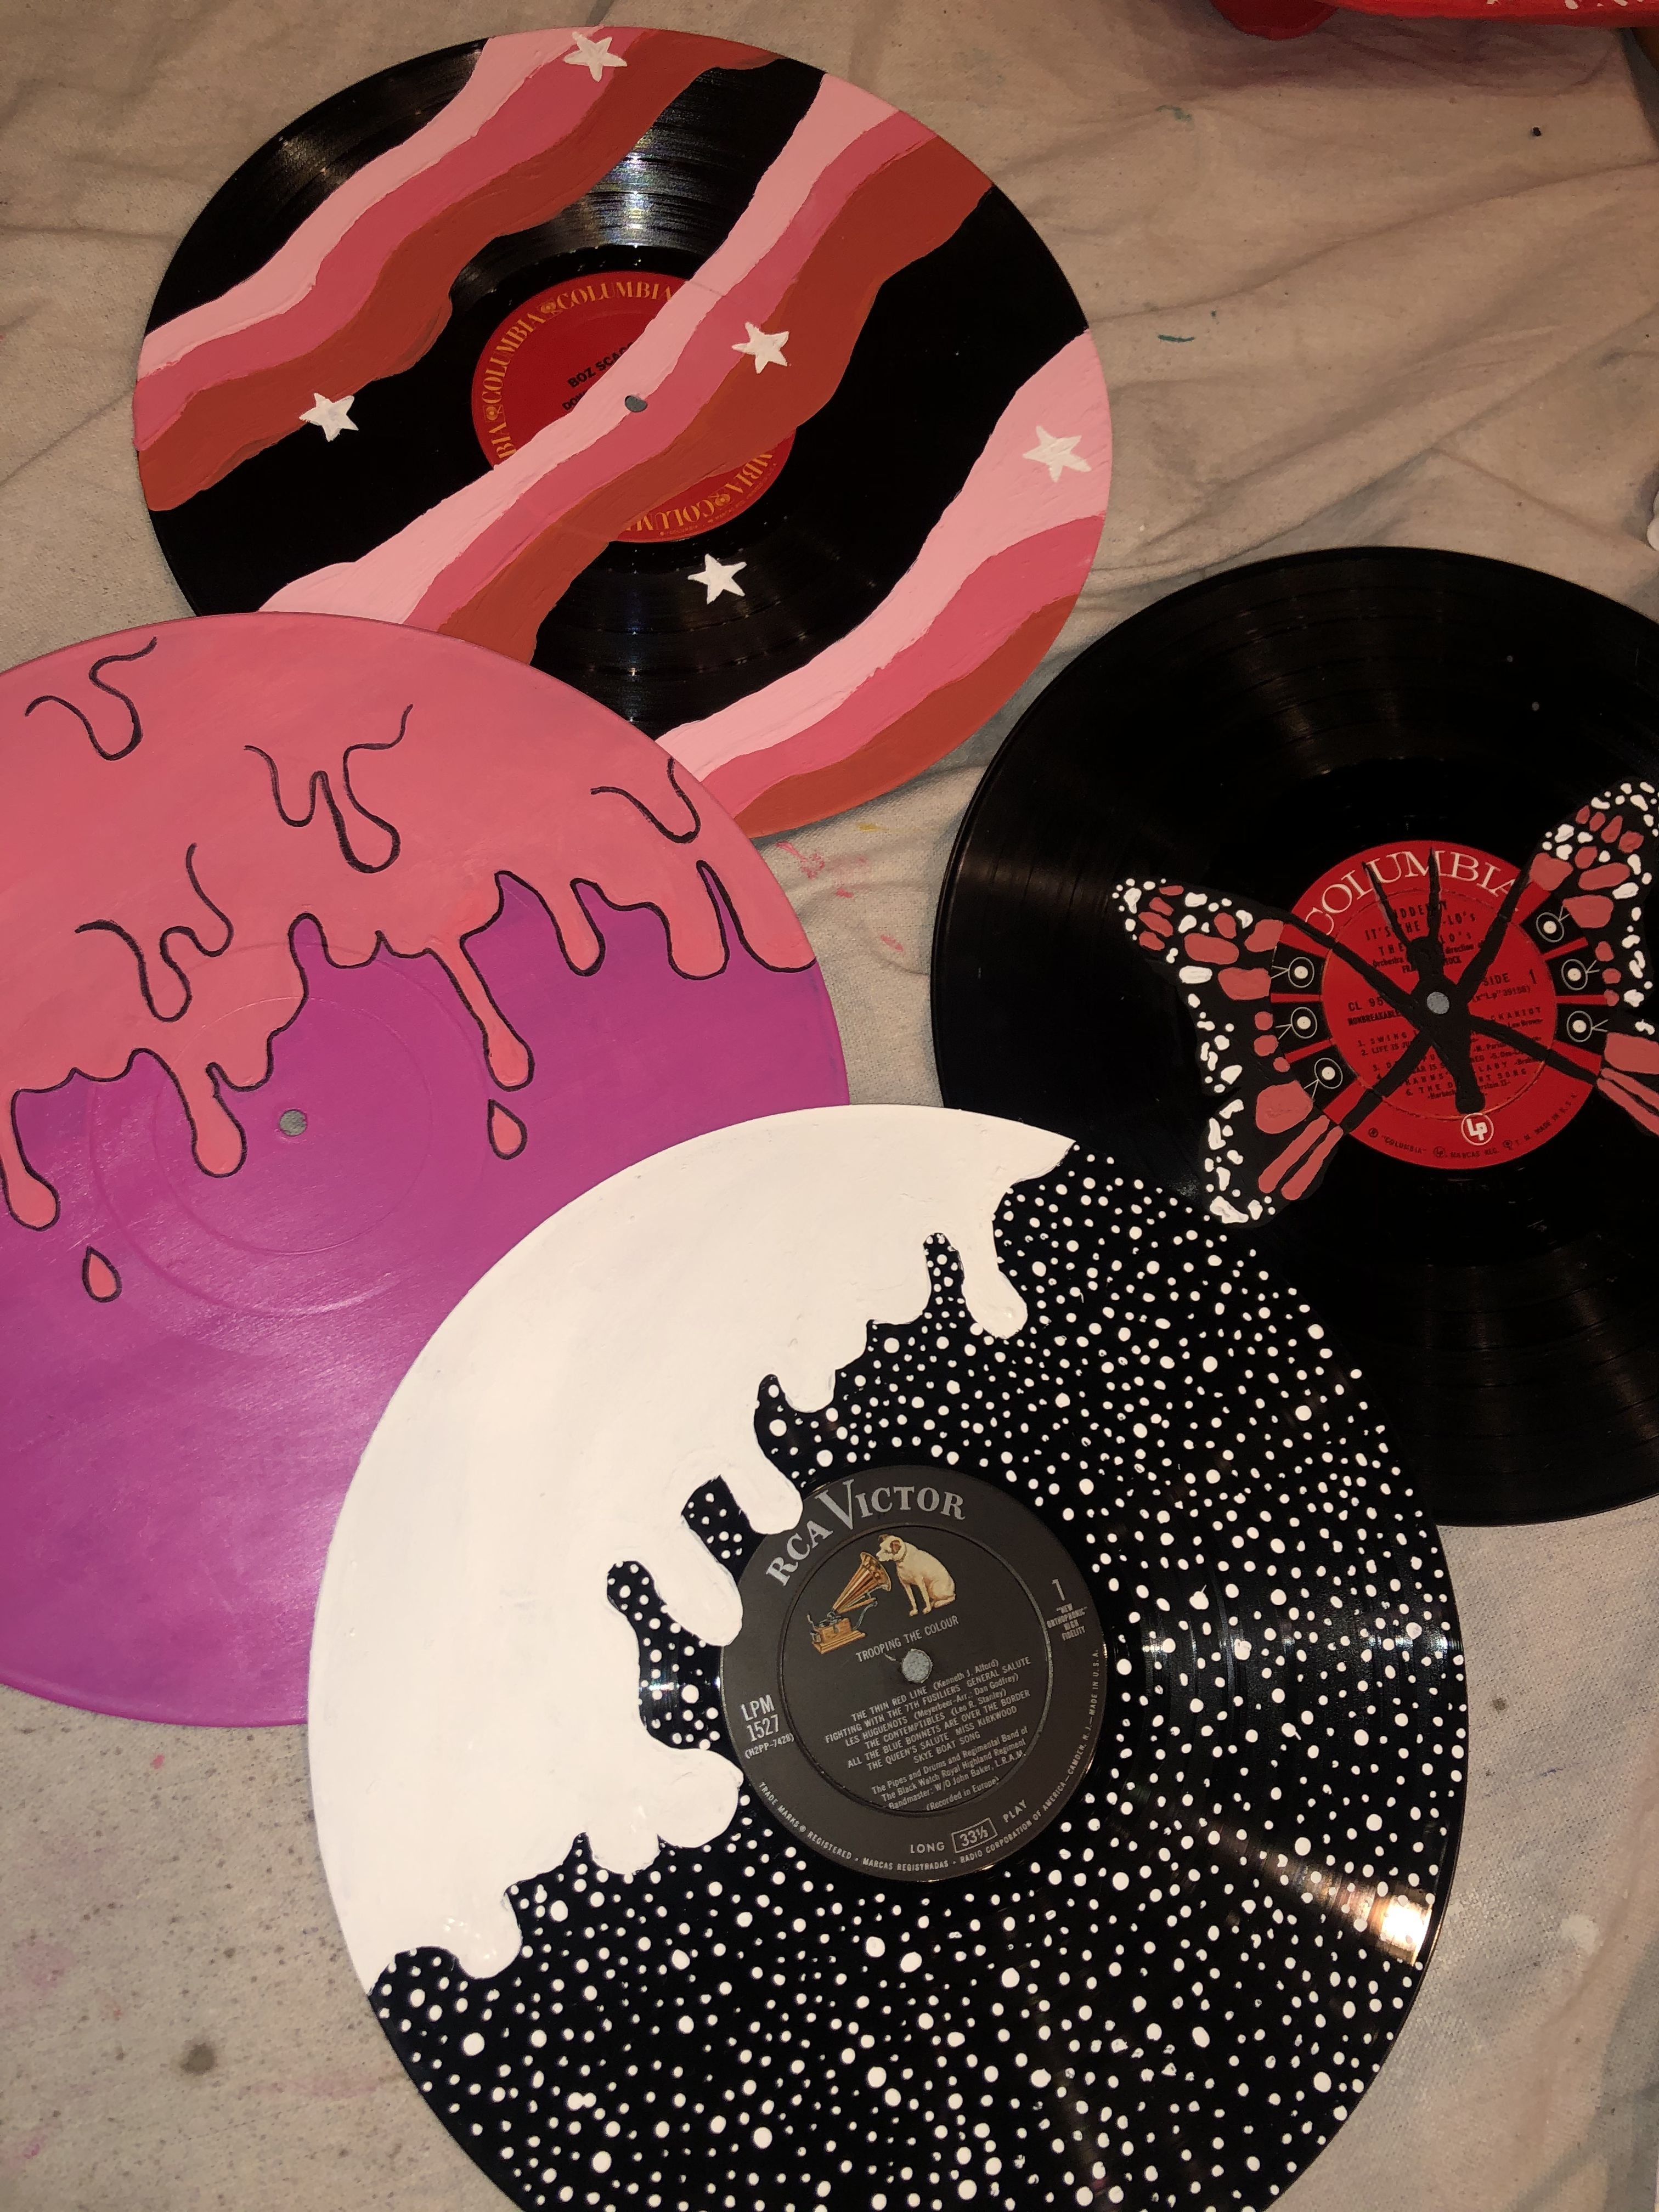 Vinyl Painting In 2020 Diy Art Painting Vinyl Art Paint Vinyl Record Art Ideas